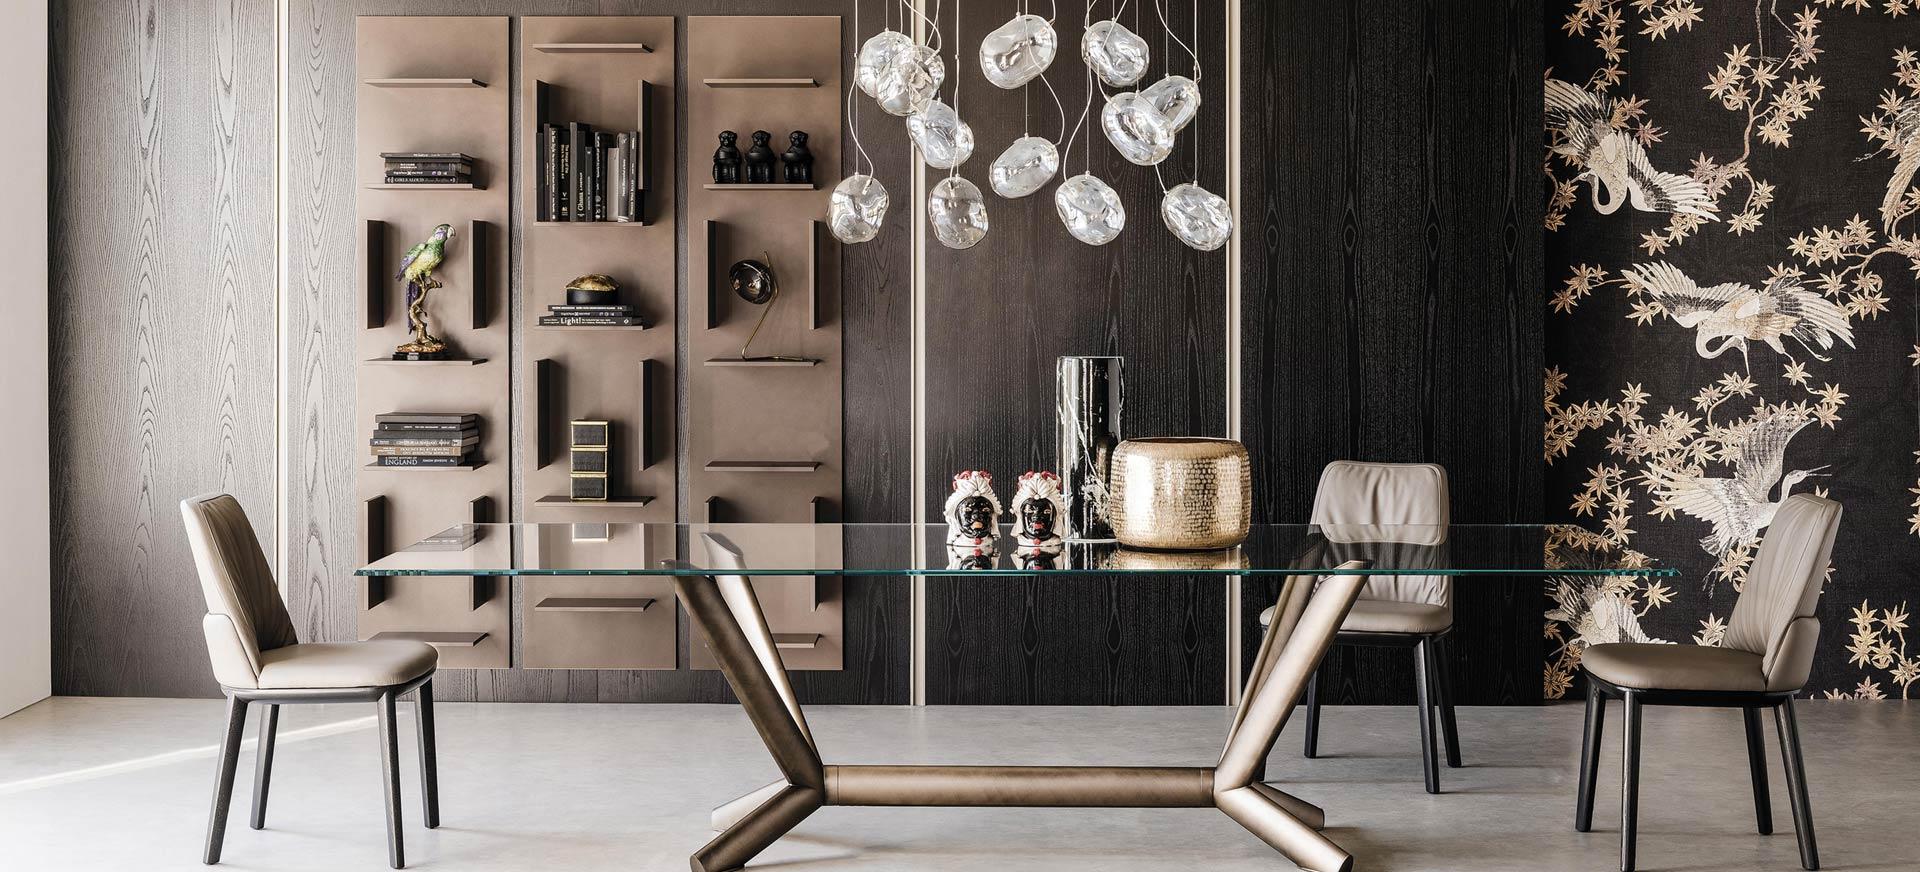 livingdesign-frankfurt – exklusive lampen und tapeten